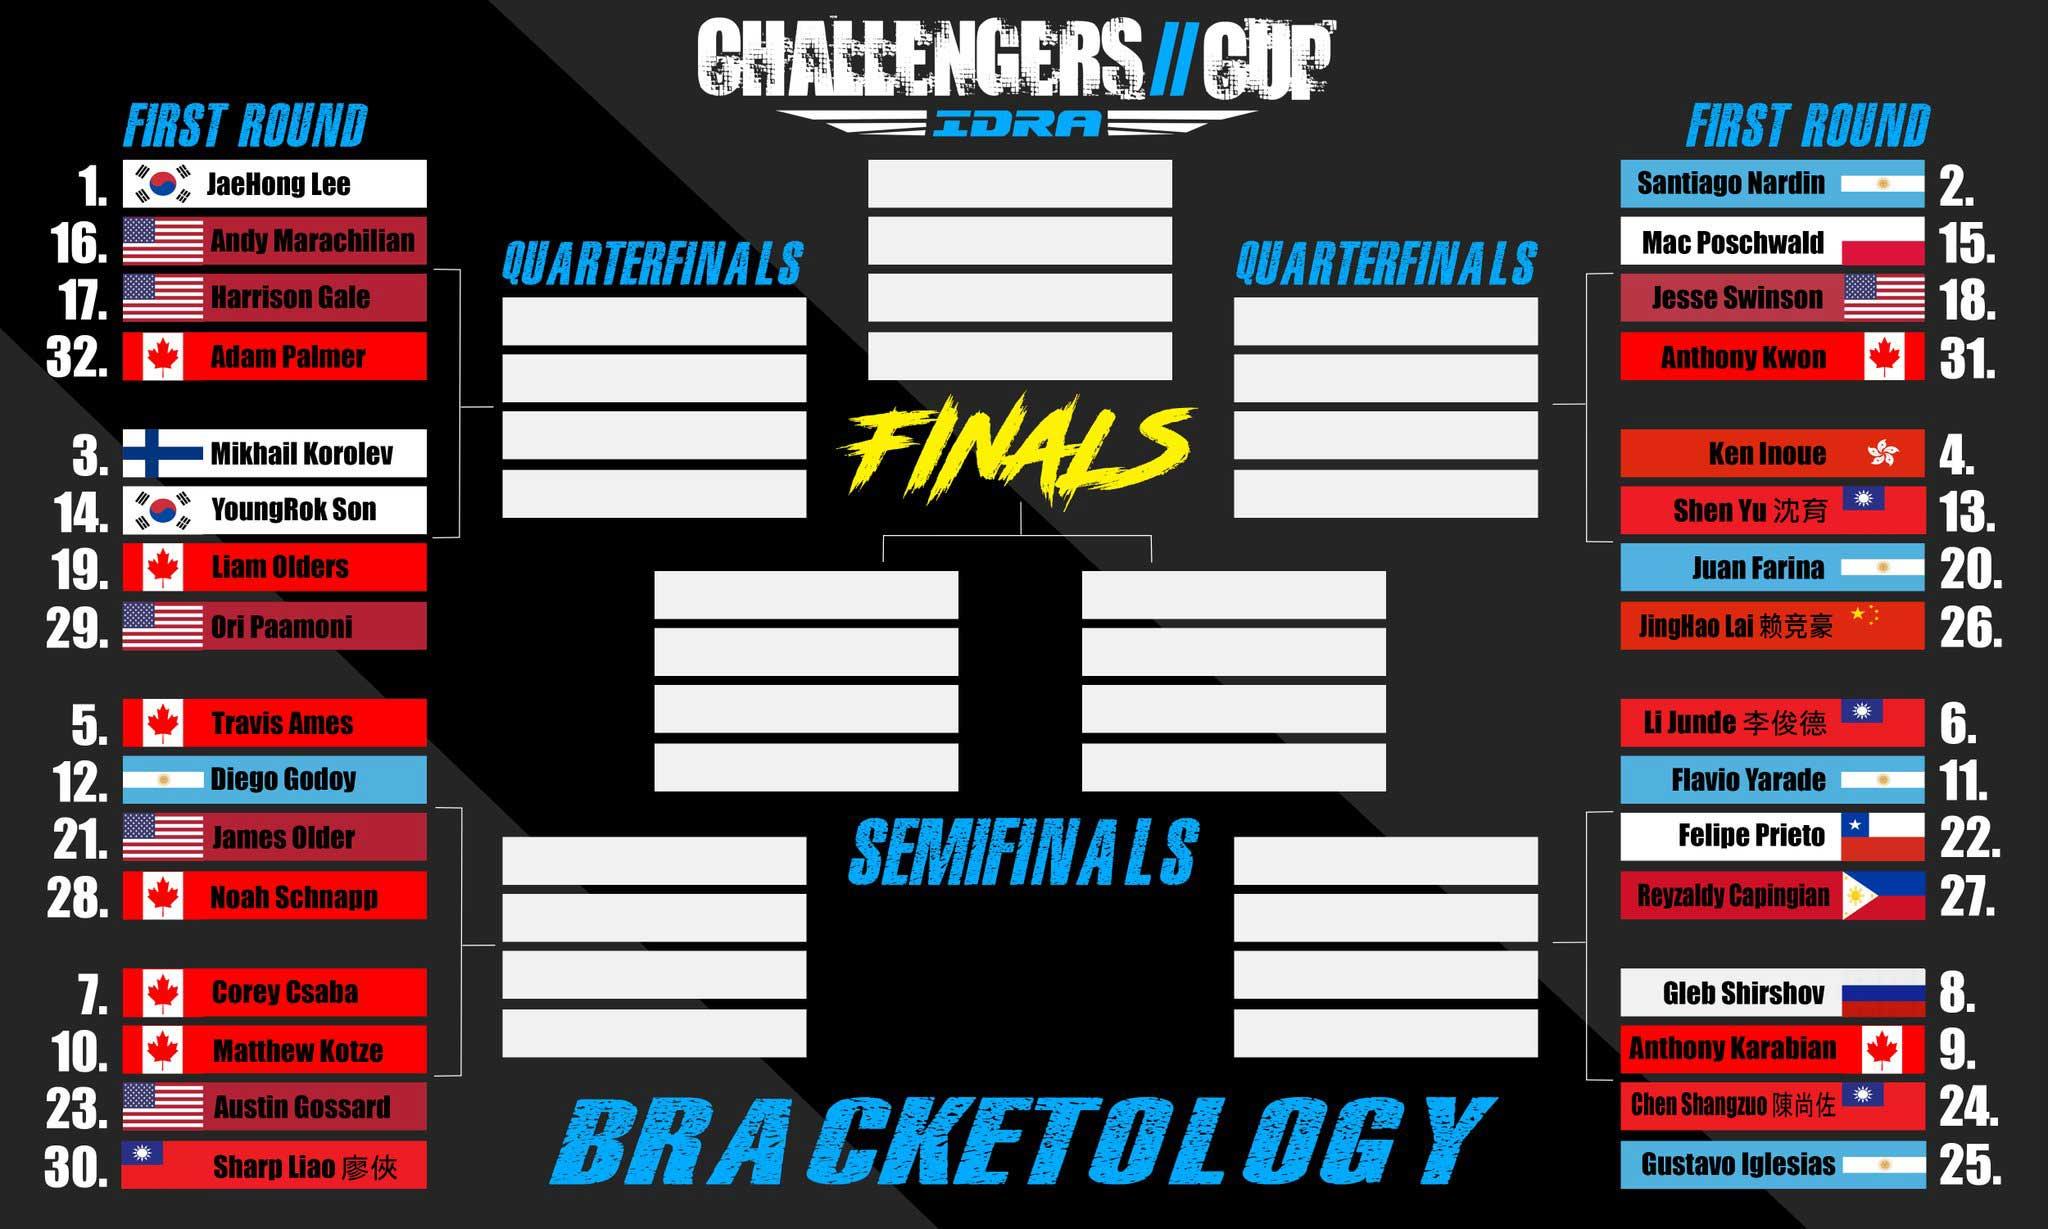 IDRA Drone Racing 2017 Challengers Cup Championship Field